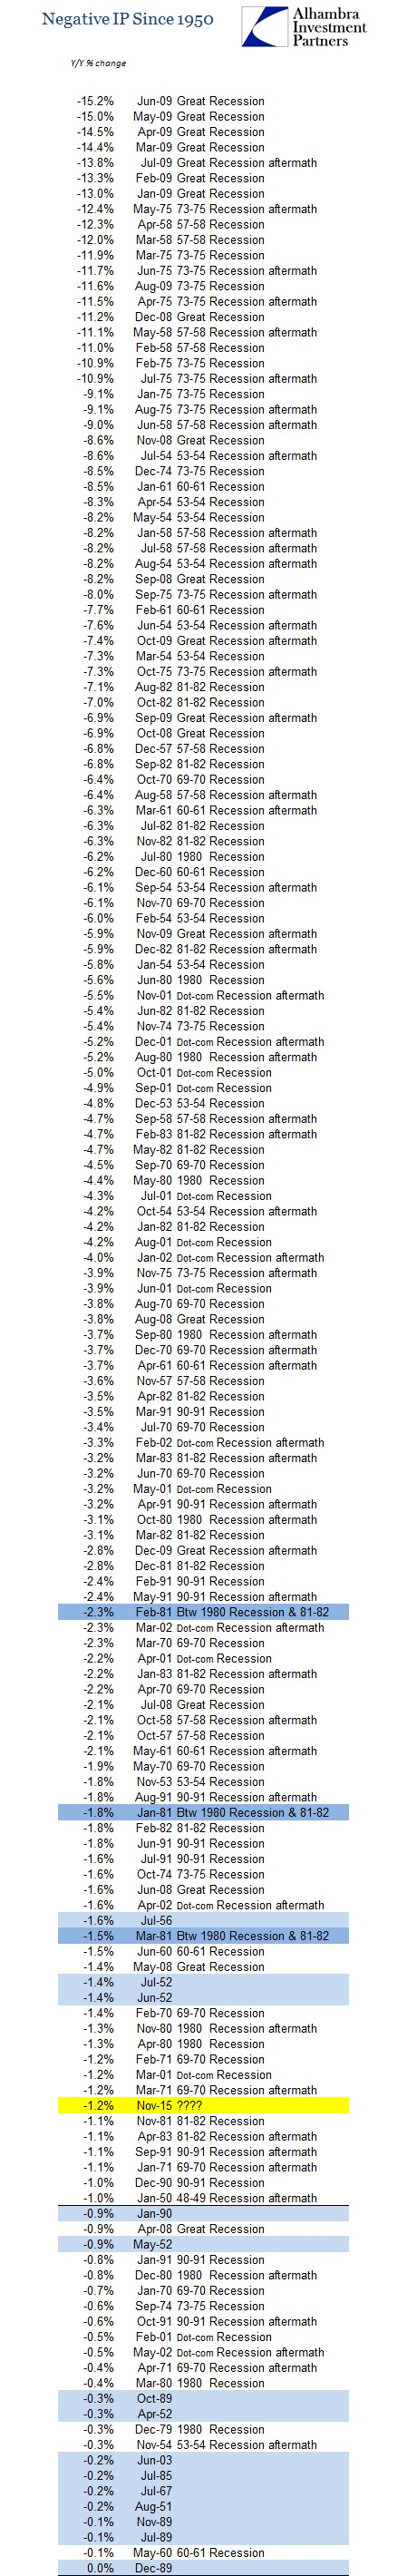 ABOOK Dec 2015 IP List